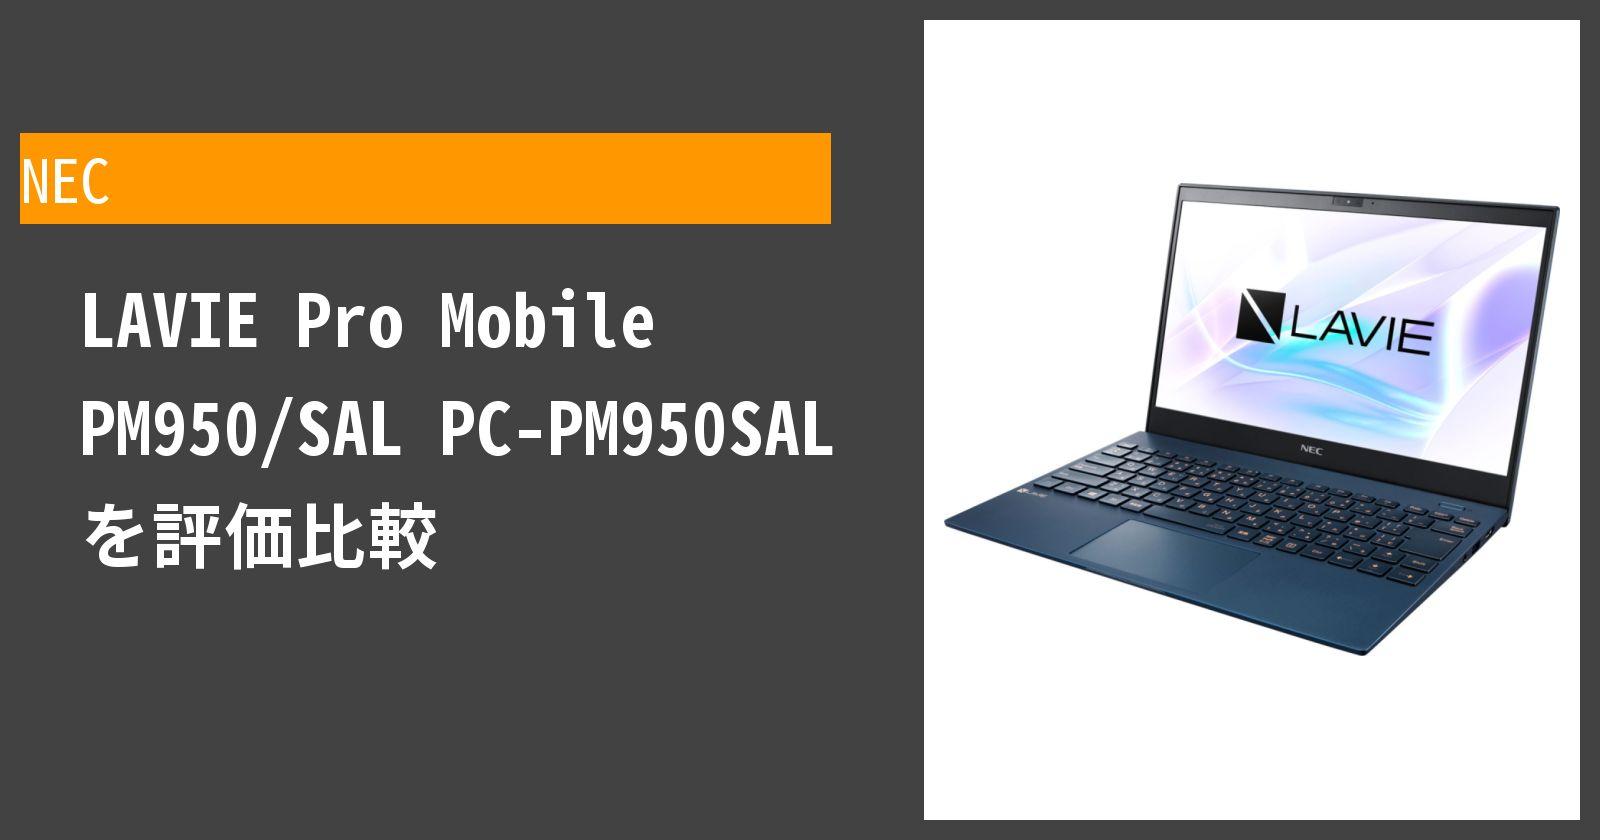 LAVIE Pro Mobile PM950/SAL PC-PM950SALを徹底評価